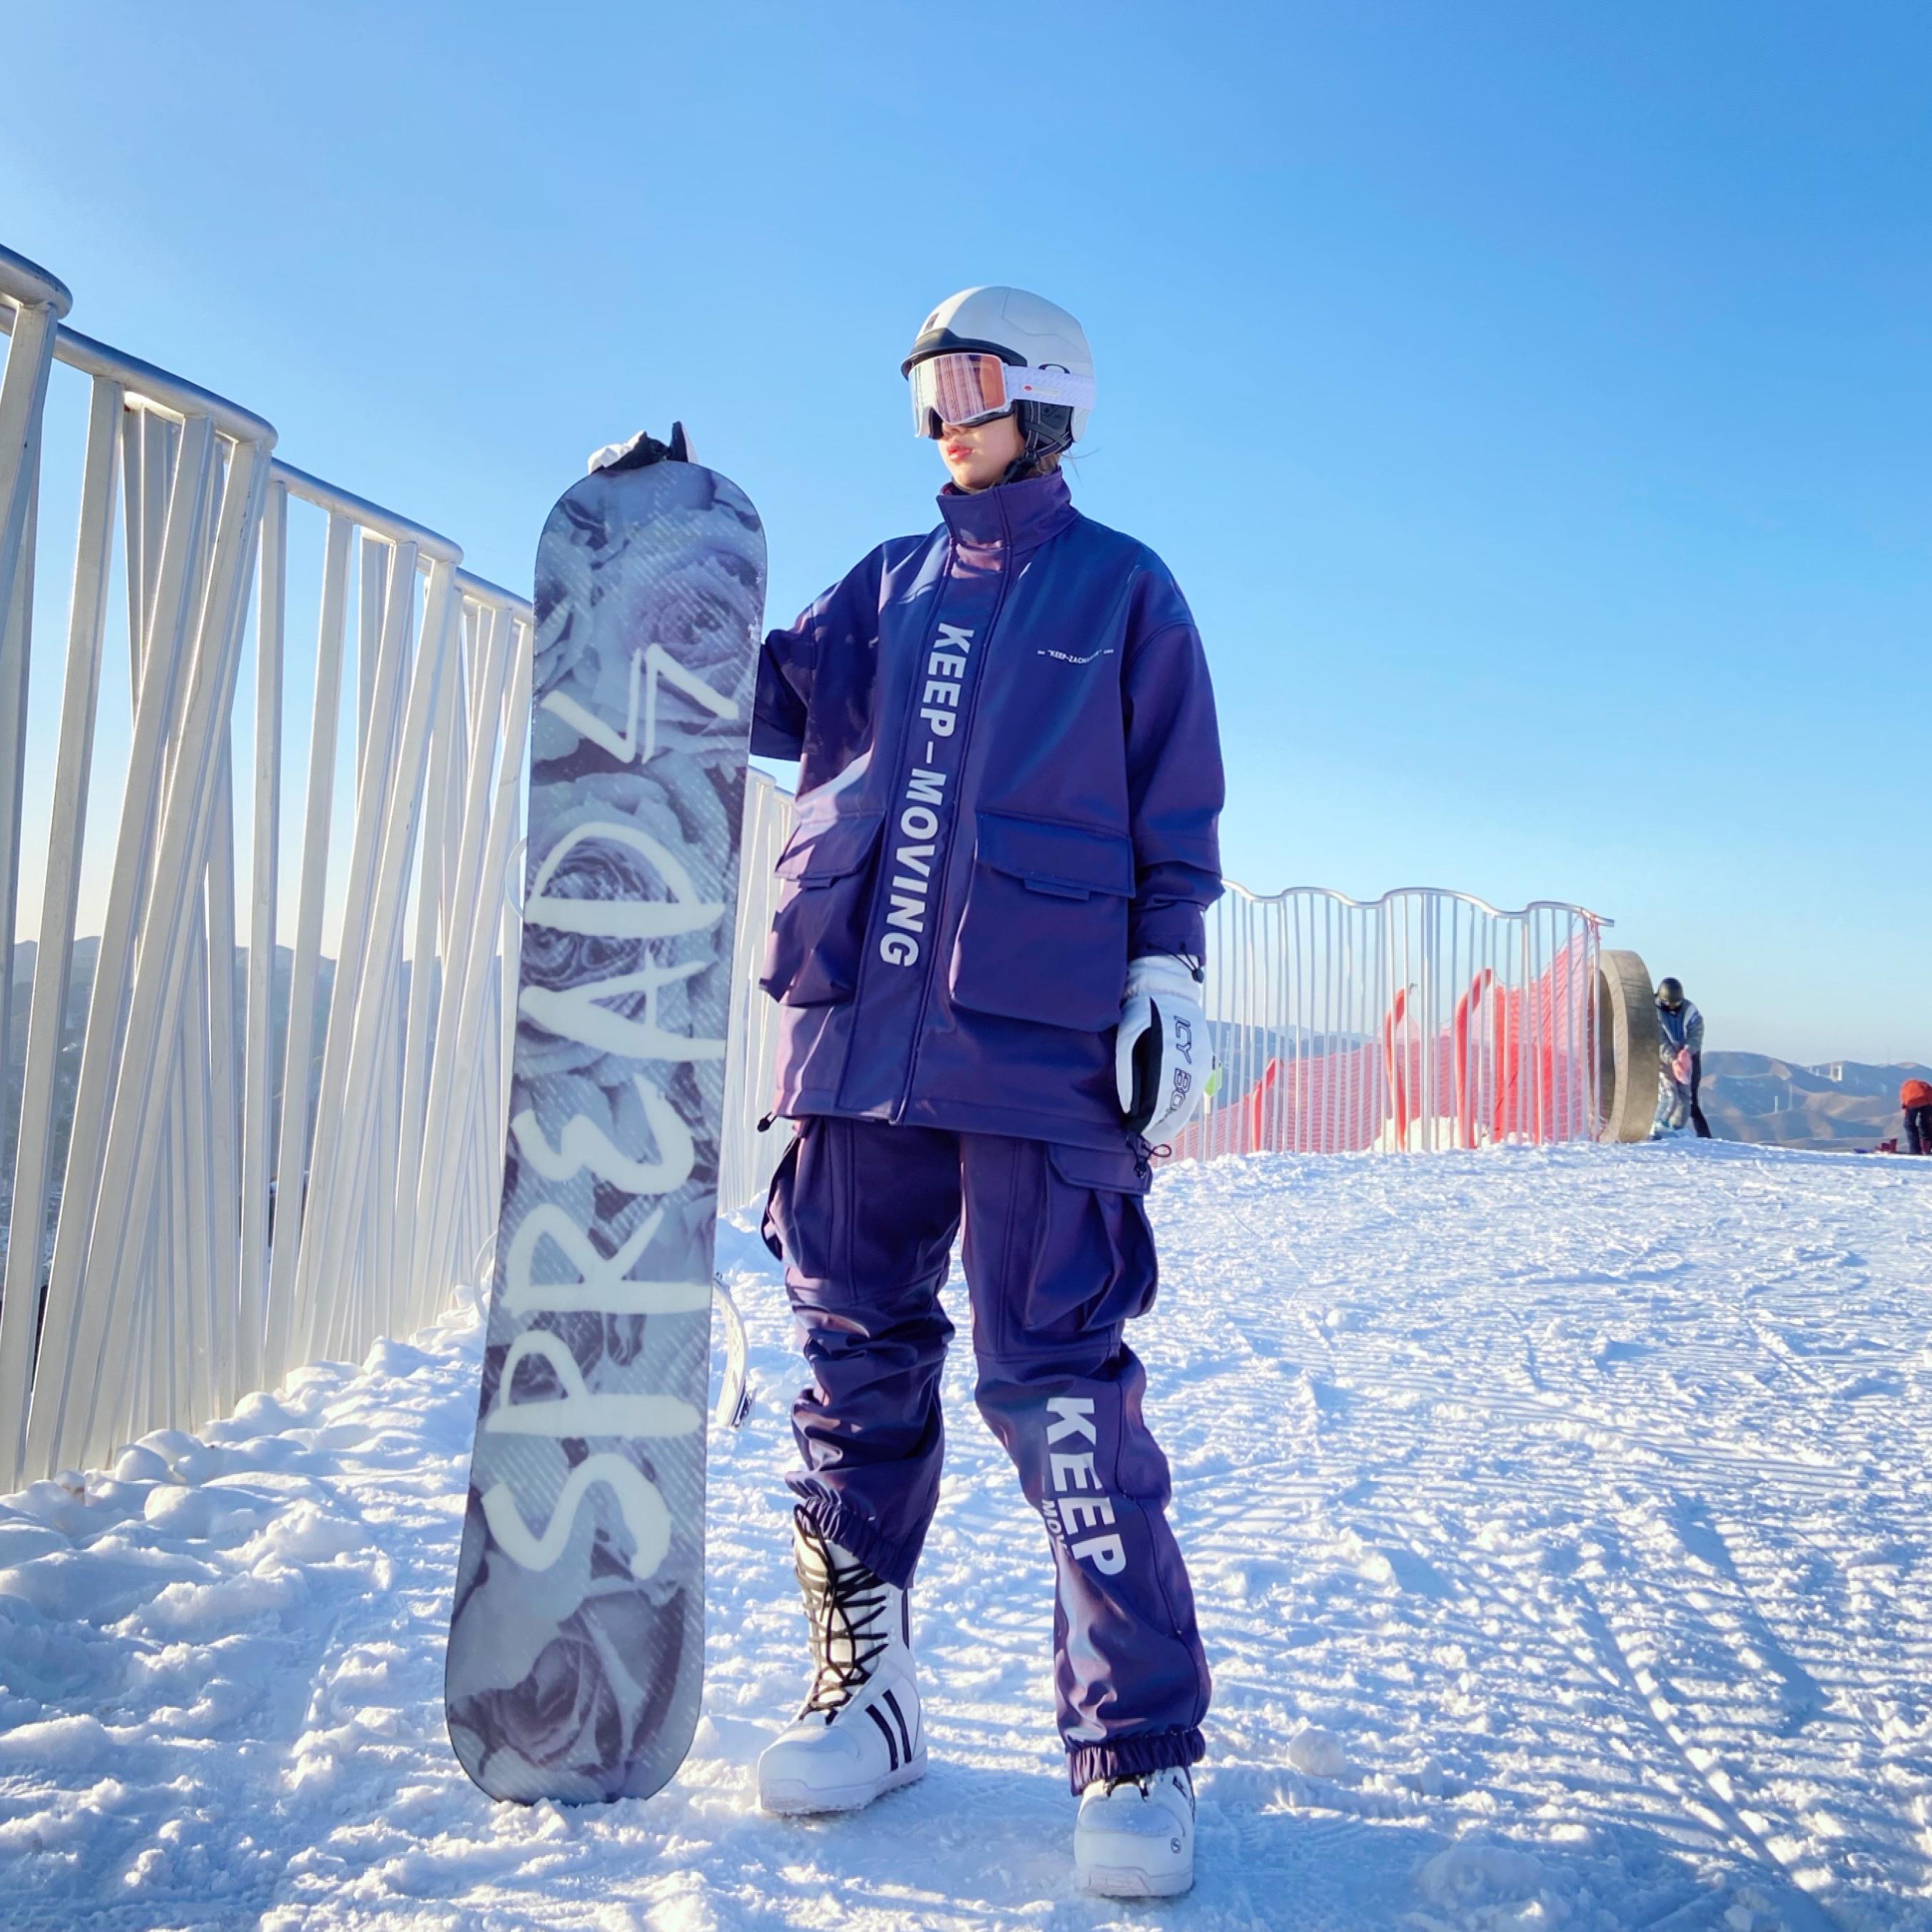 Zachariah ski suit mens single board double board waterproof plus thick purple dazzling reflective snowboarding suit girl